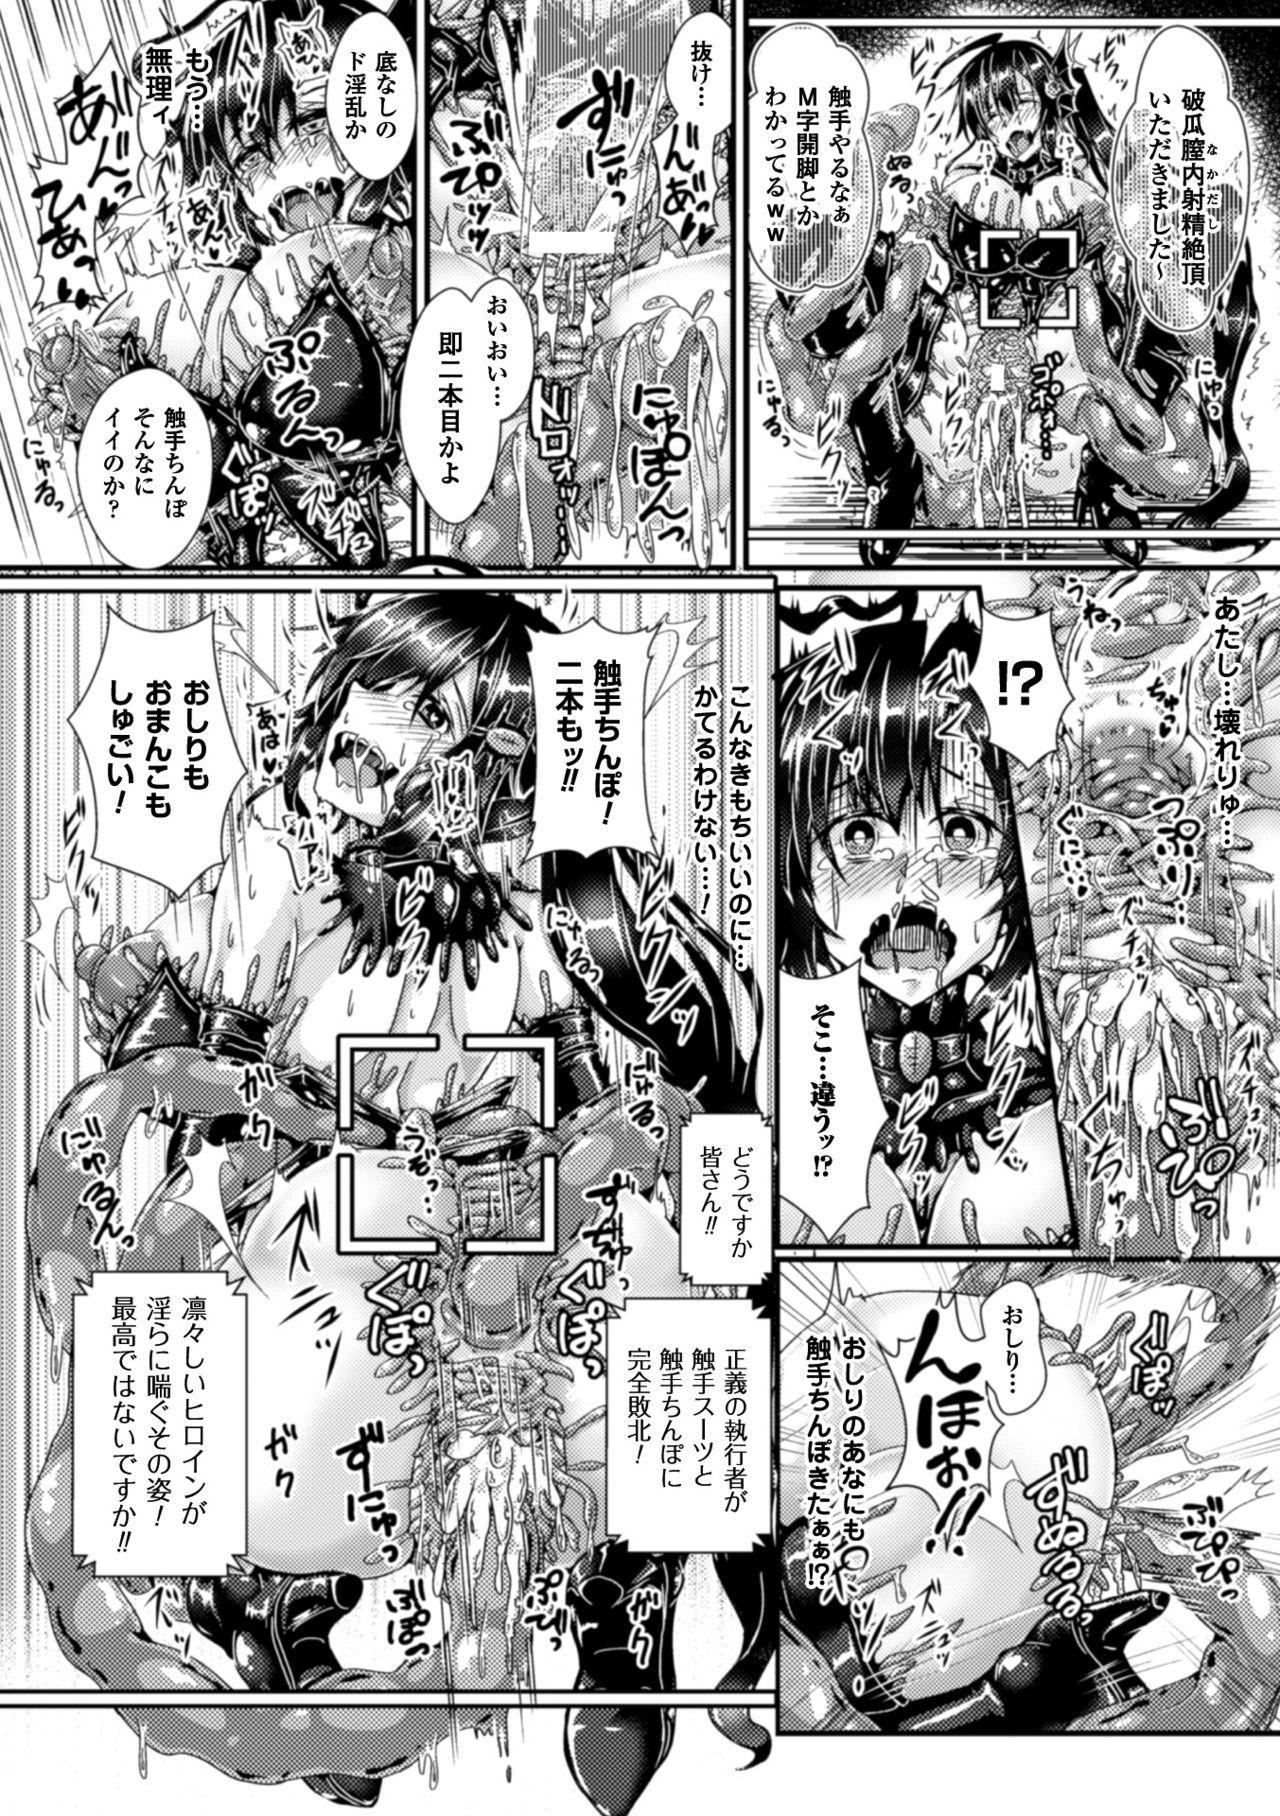 2D Comic Magazine Shokushu Yoroi ni Zenshin o Okasare Mugen Zecchou! Vol. 5 56